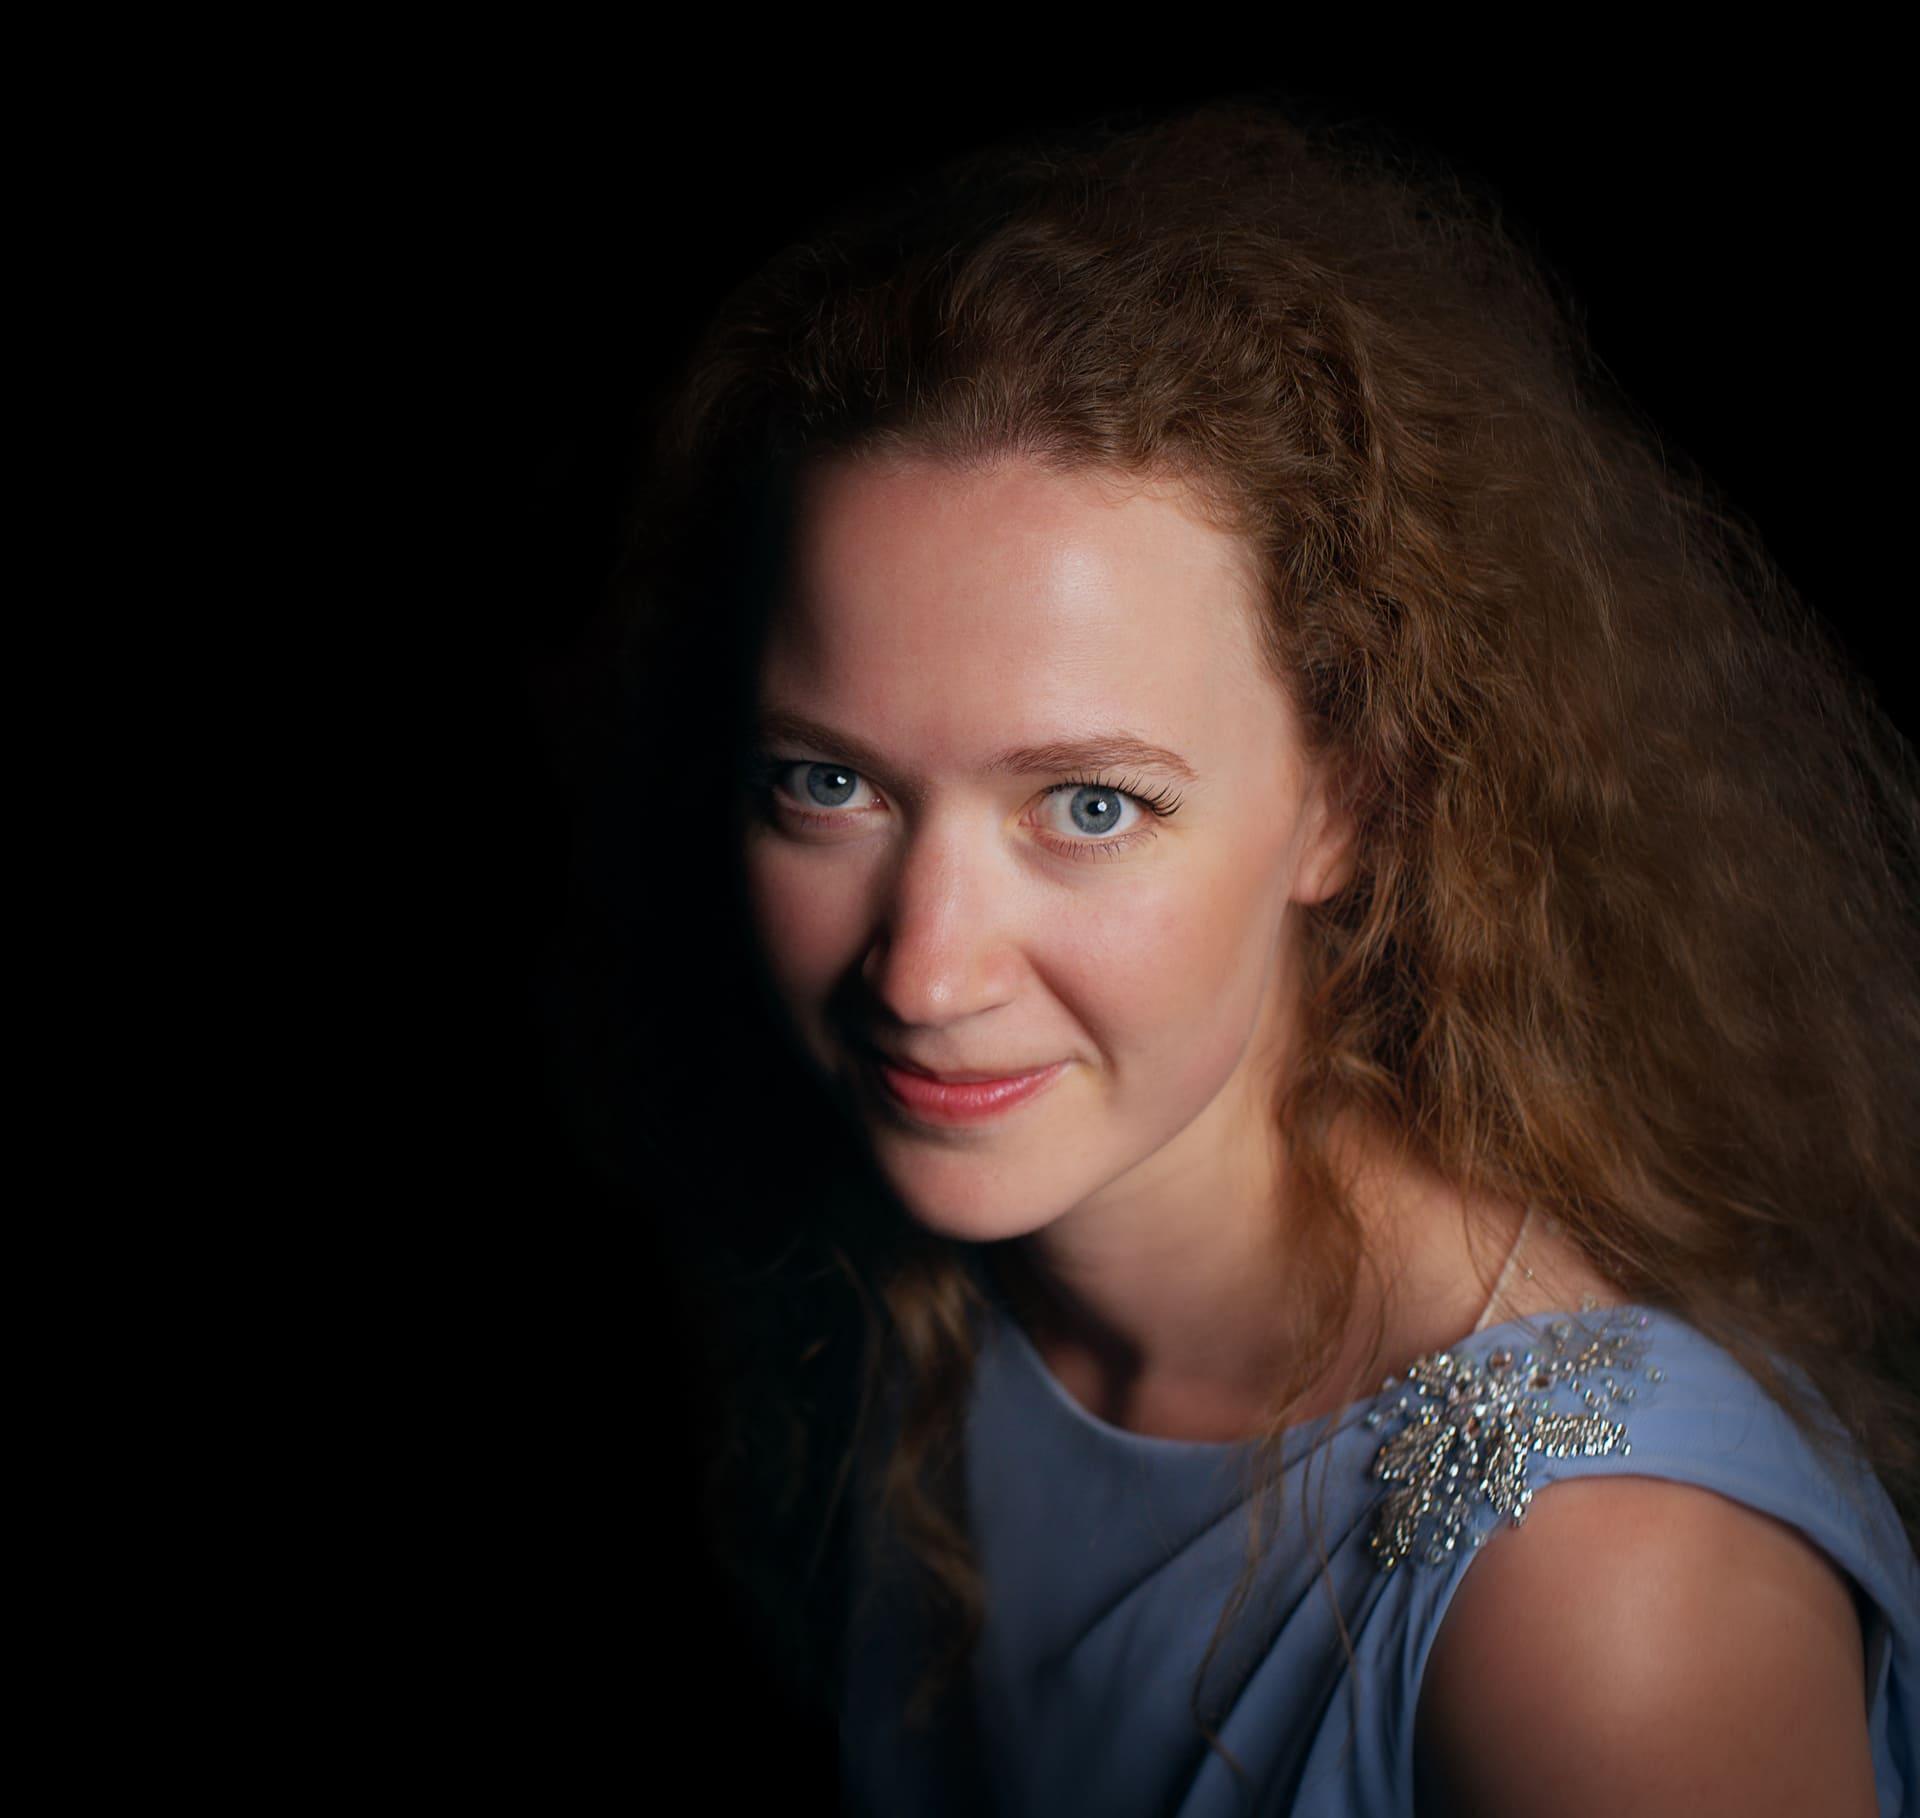 Jessica Elevant 2 kompr. web - photo by Helgi Reynisson